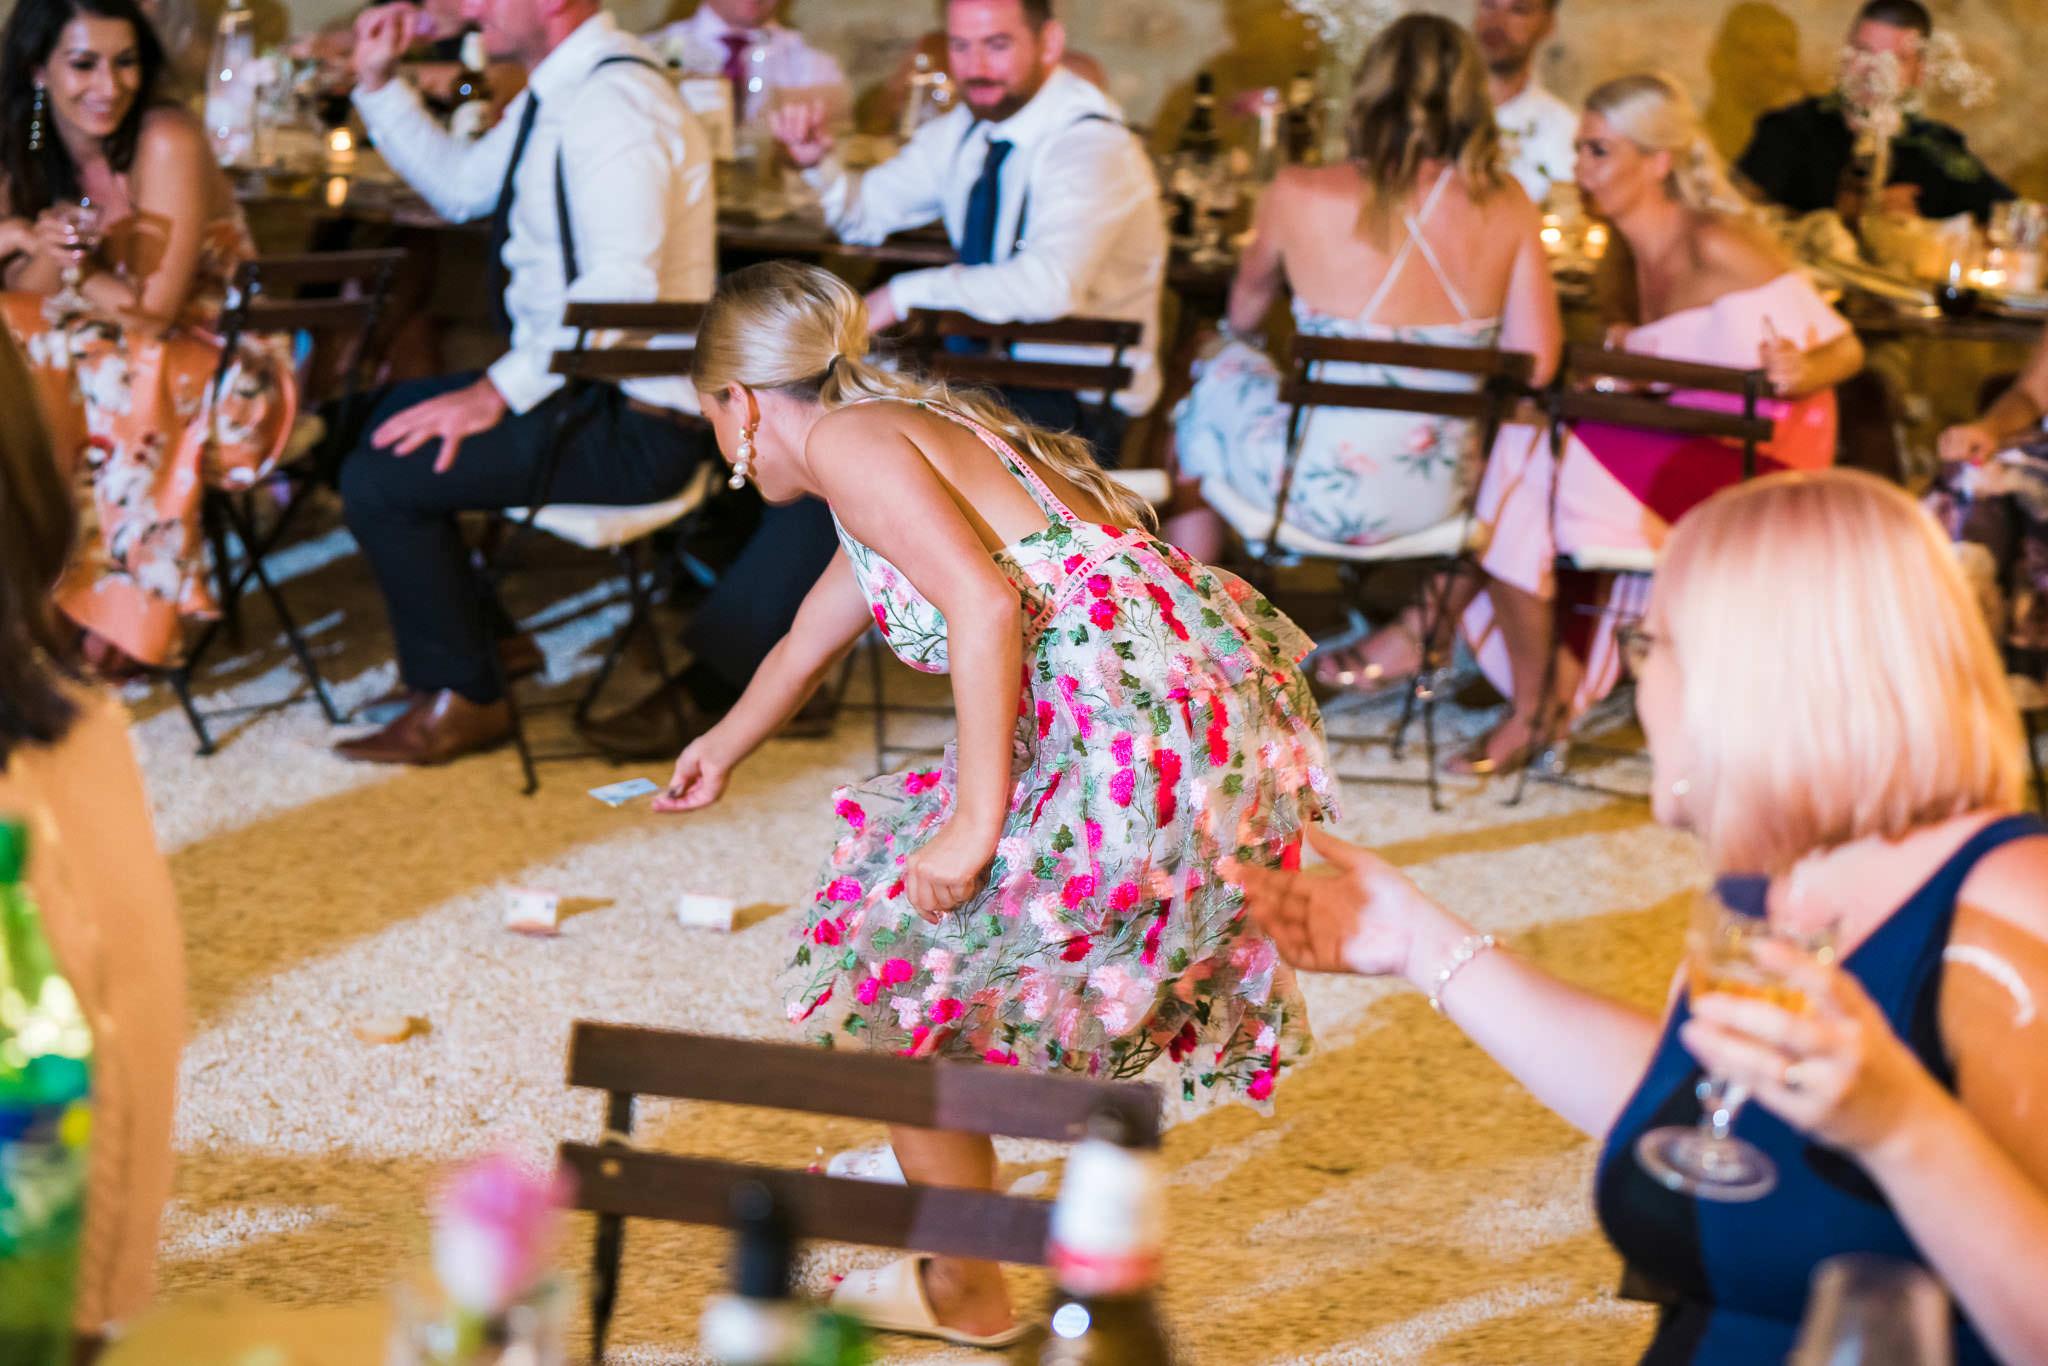 NC-2018-09-07_gemma-and-steve-wedding-2300.jpg